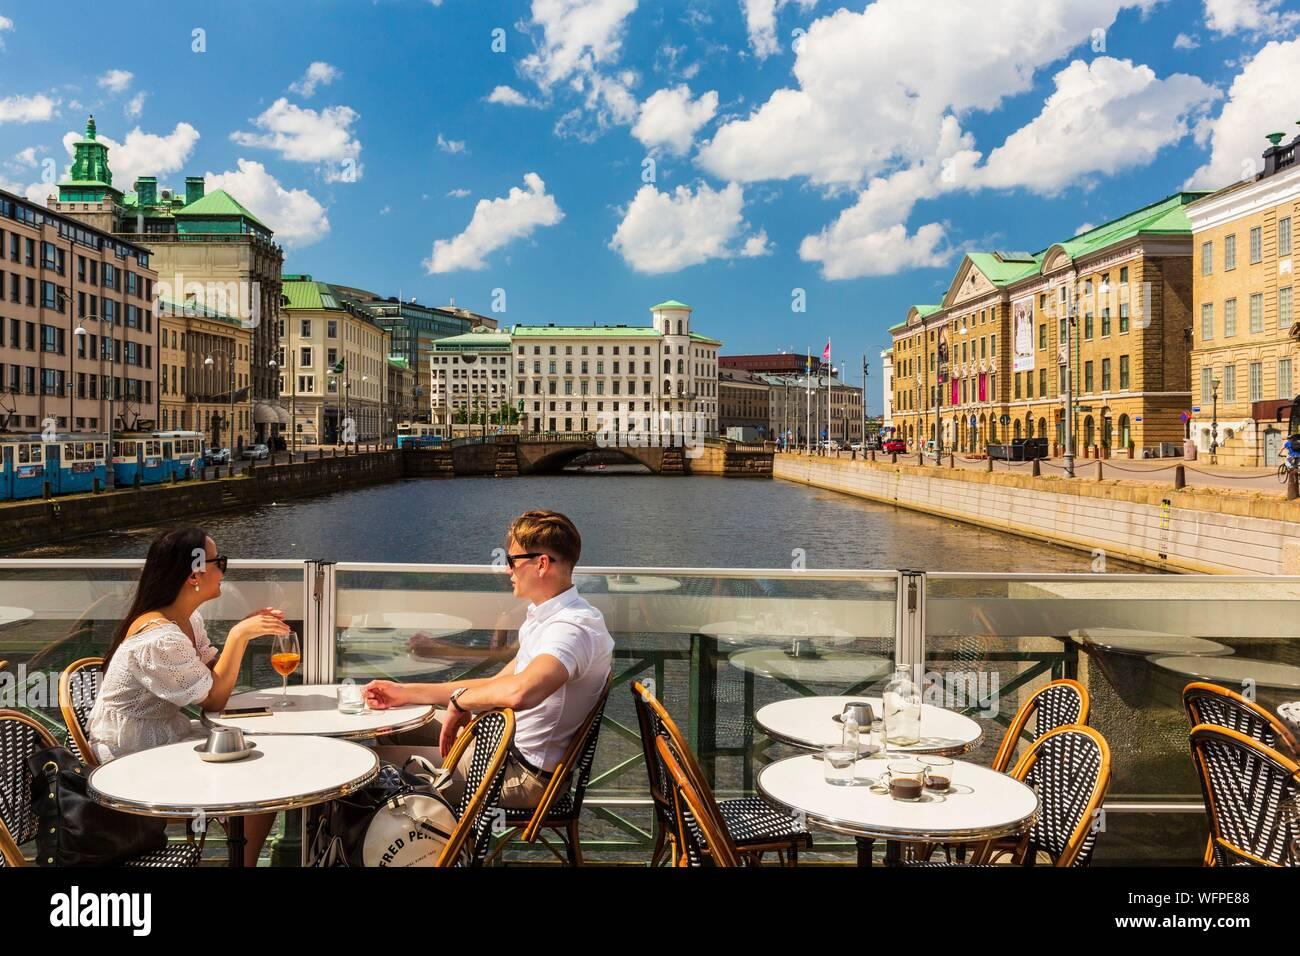 Sweden Vastra Gotaland Goteborg Gothenburg Hamm Kanalen Canal Stock Photo Alamy